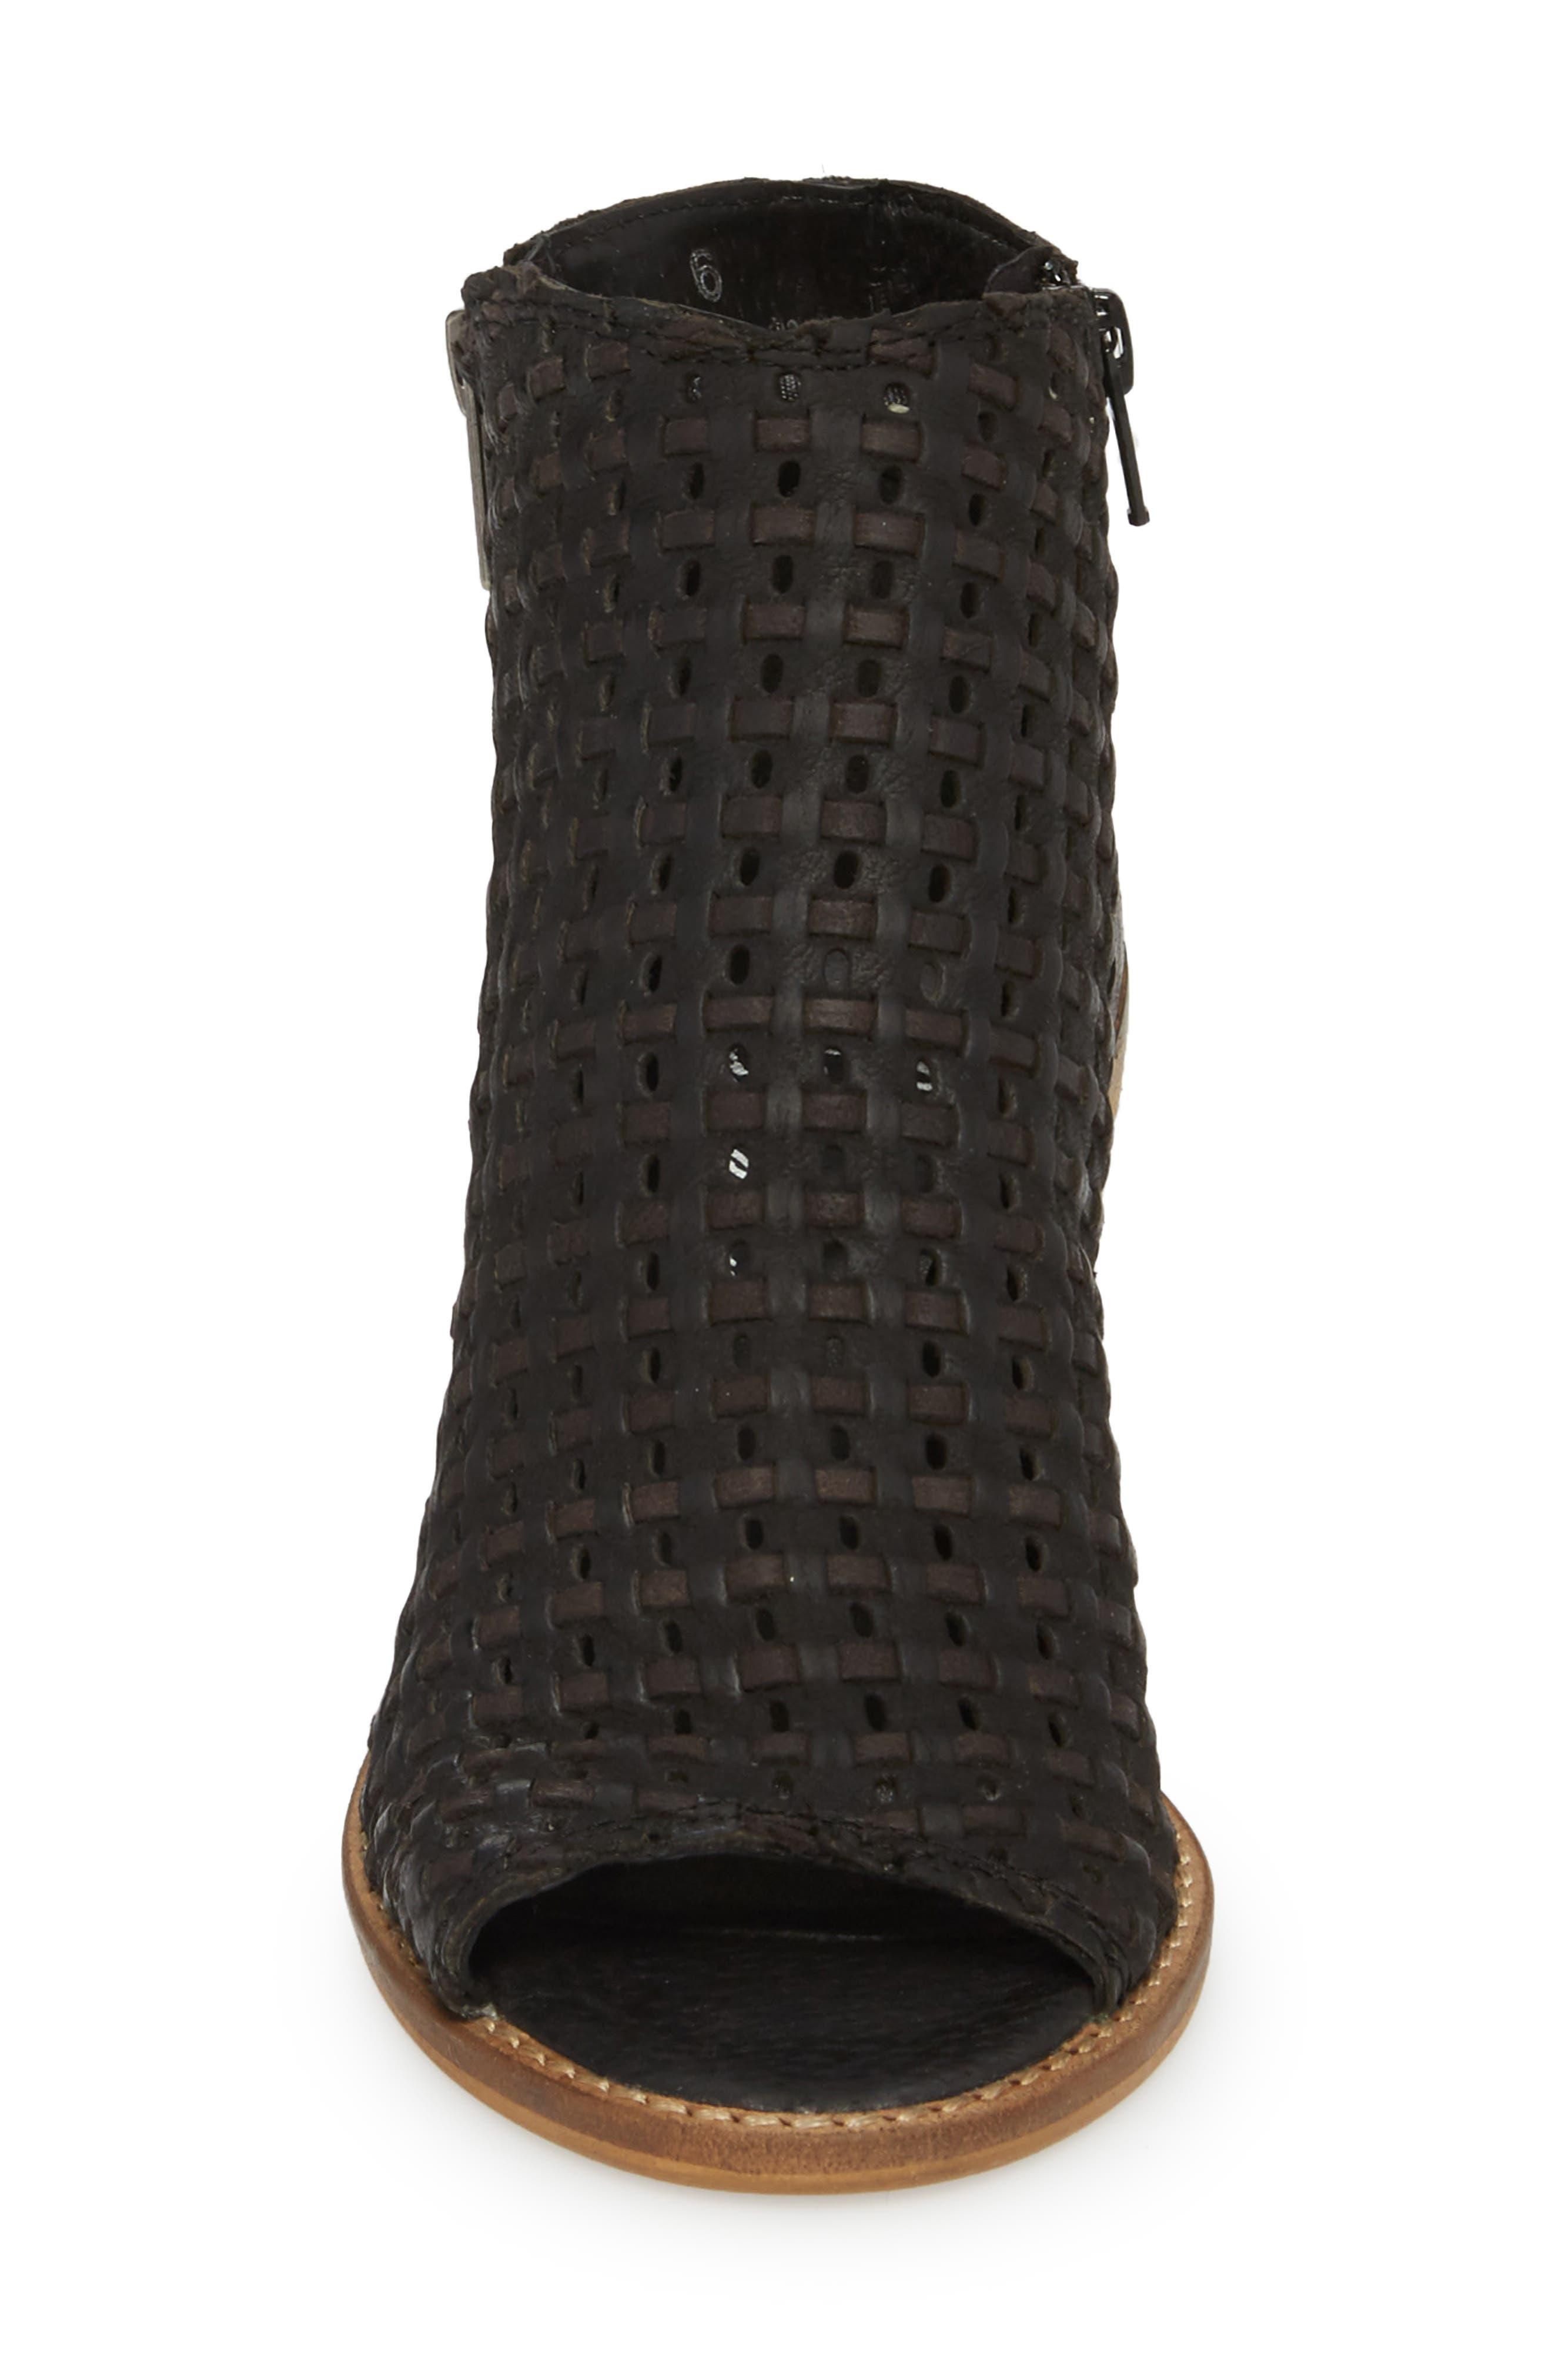 Waterfront Peep Toe Bootie,                             Alternate thumbnail 4, color,                             Black Leather